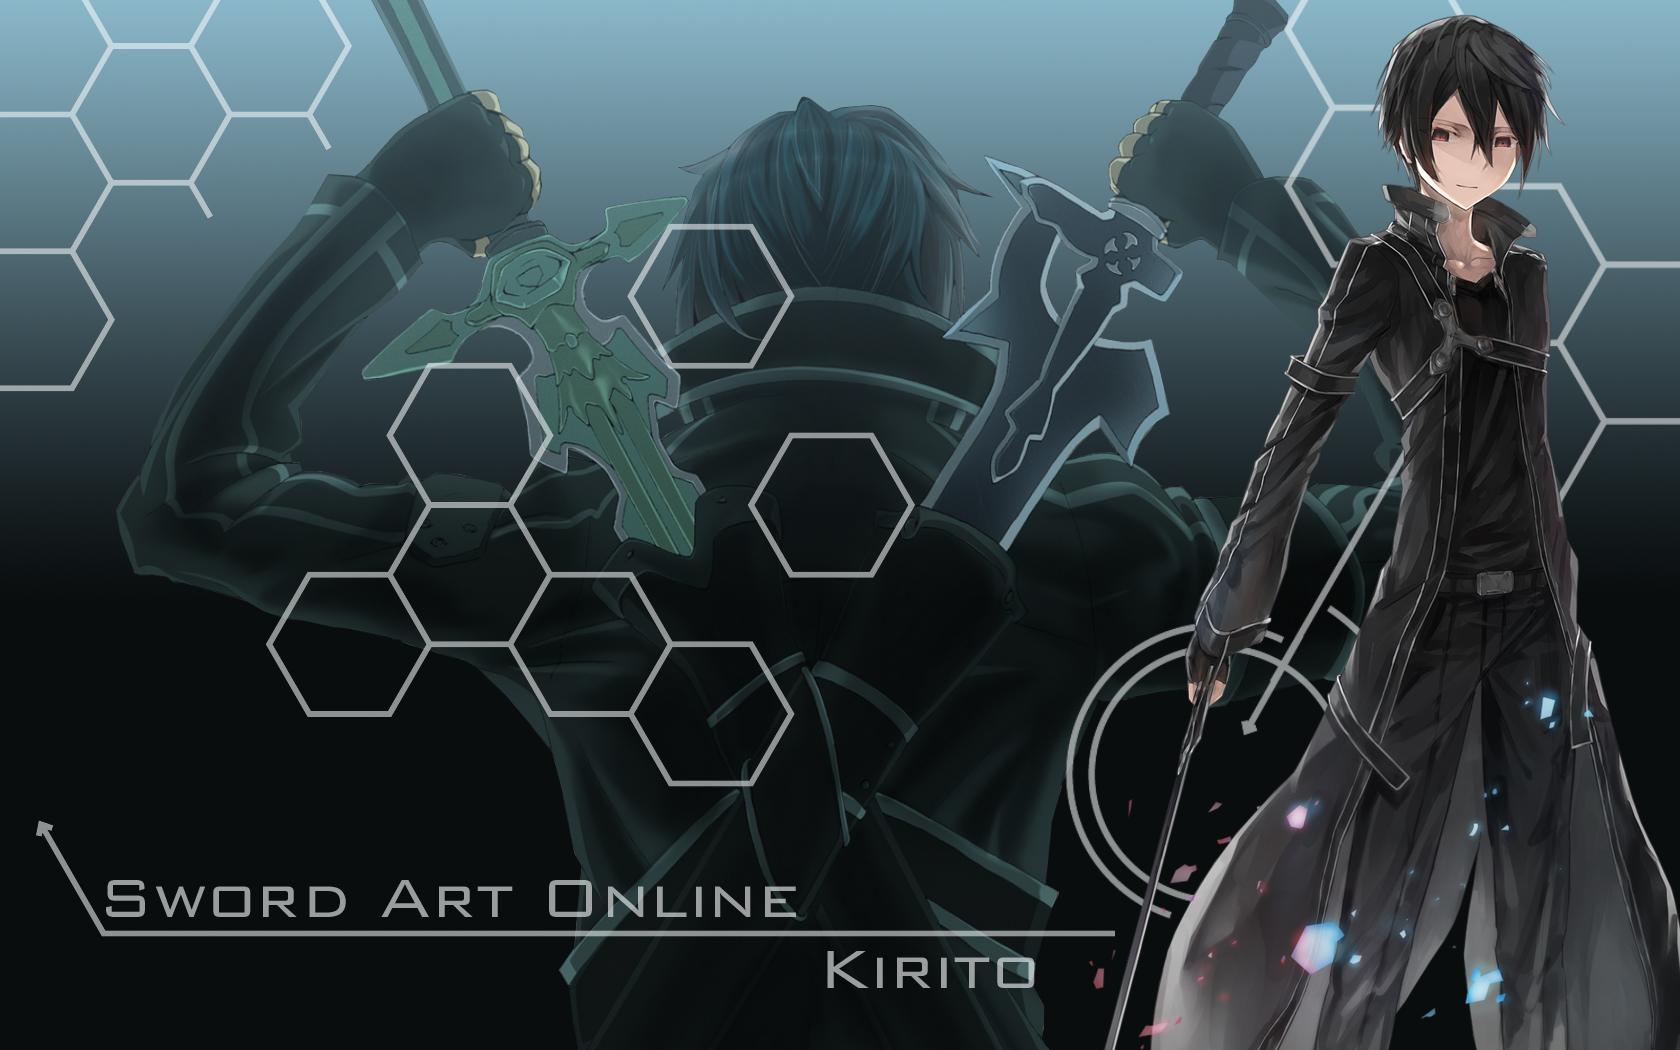 sword_art_online___kirito_wallpaper_by_yugoku_chan-d5nbd34.jpg